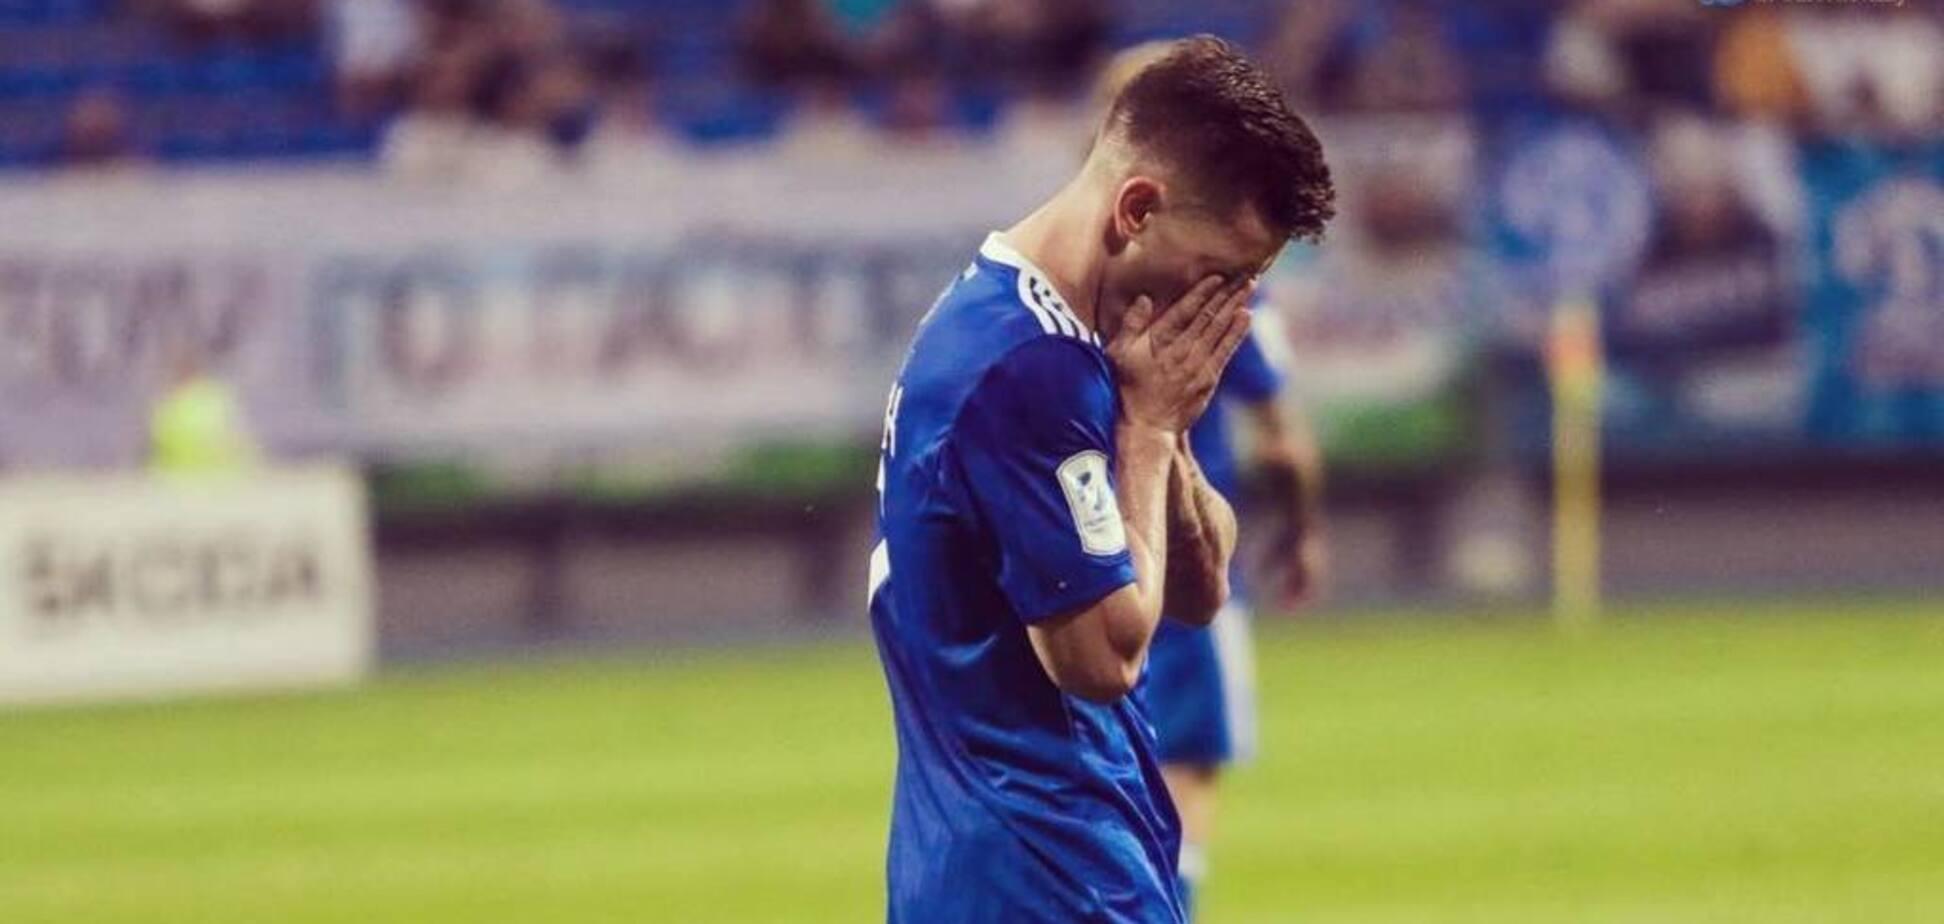 'Динамо' понесло тяжелую потерю перед матчем с 'Челси'